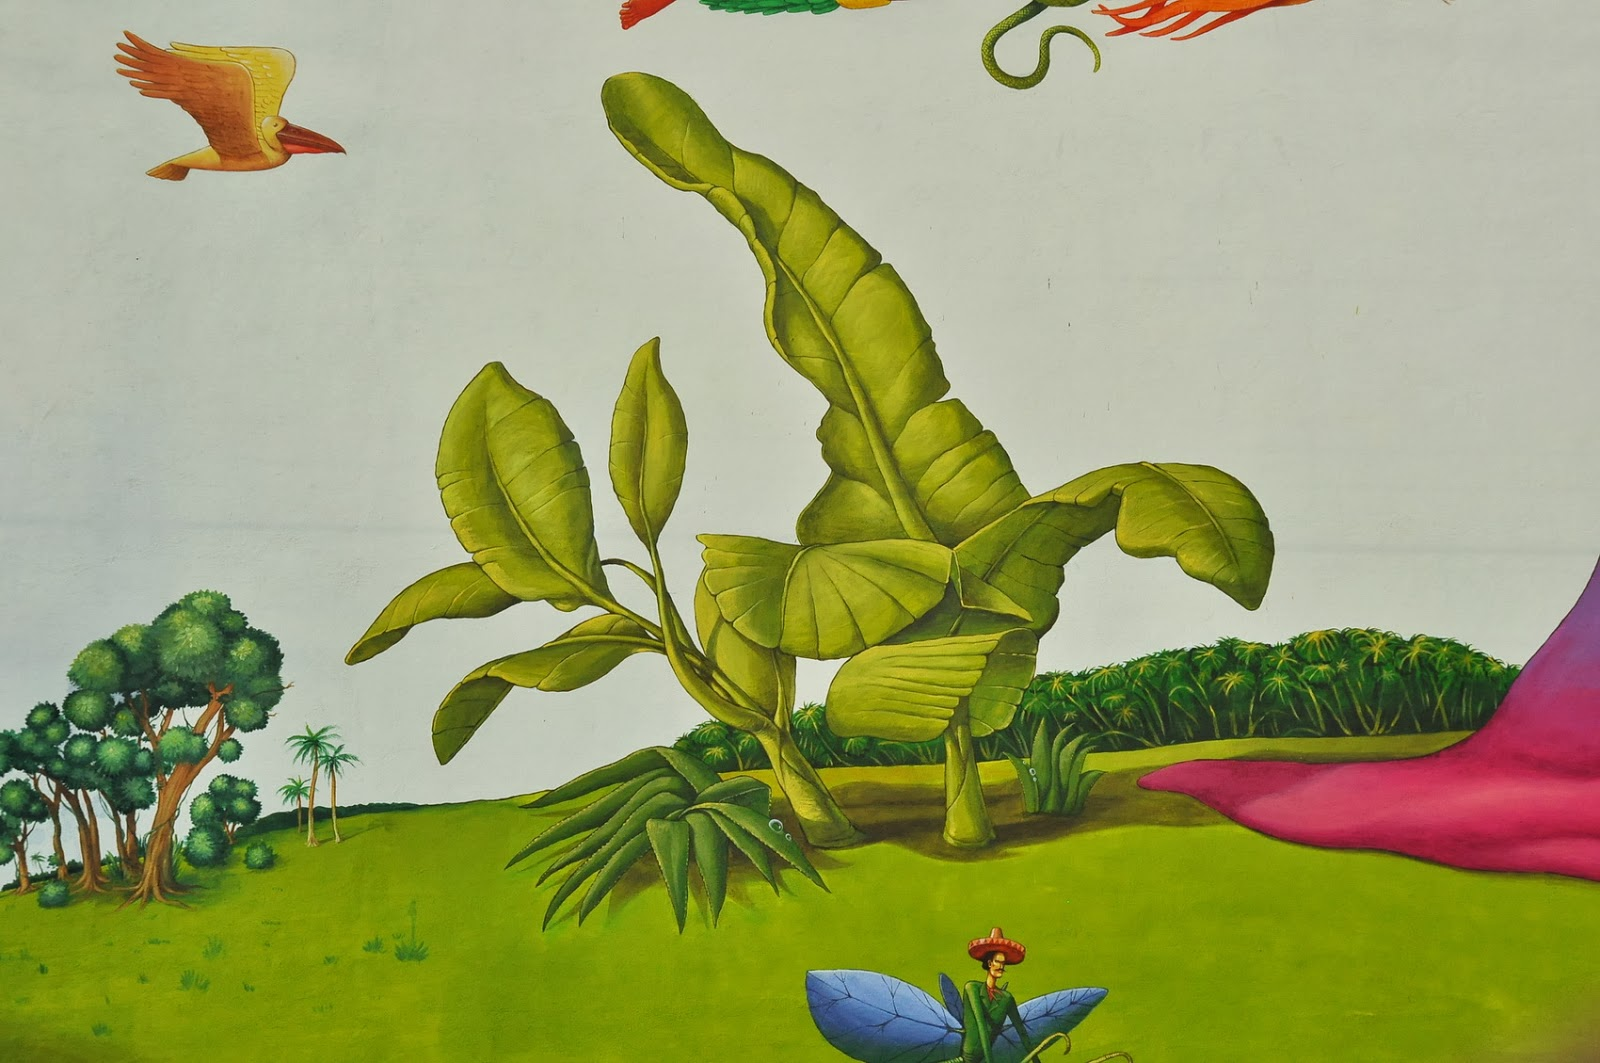 interesni-kazki-new-mural-campeche-mexico-18